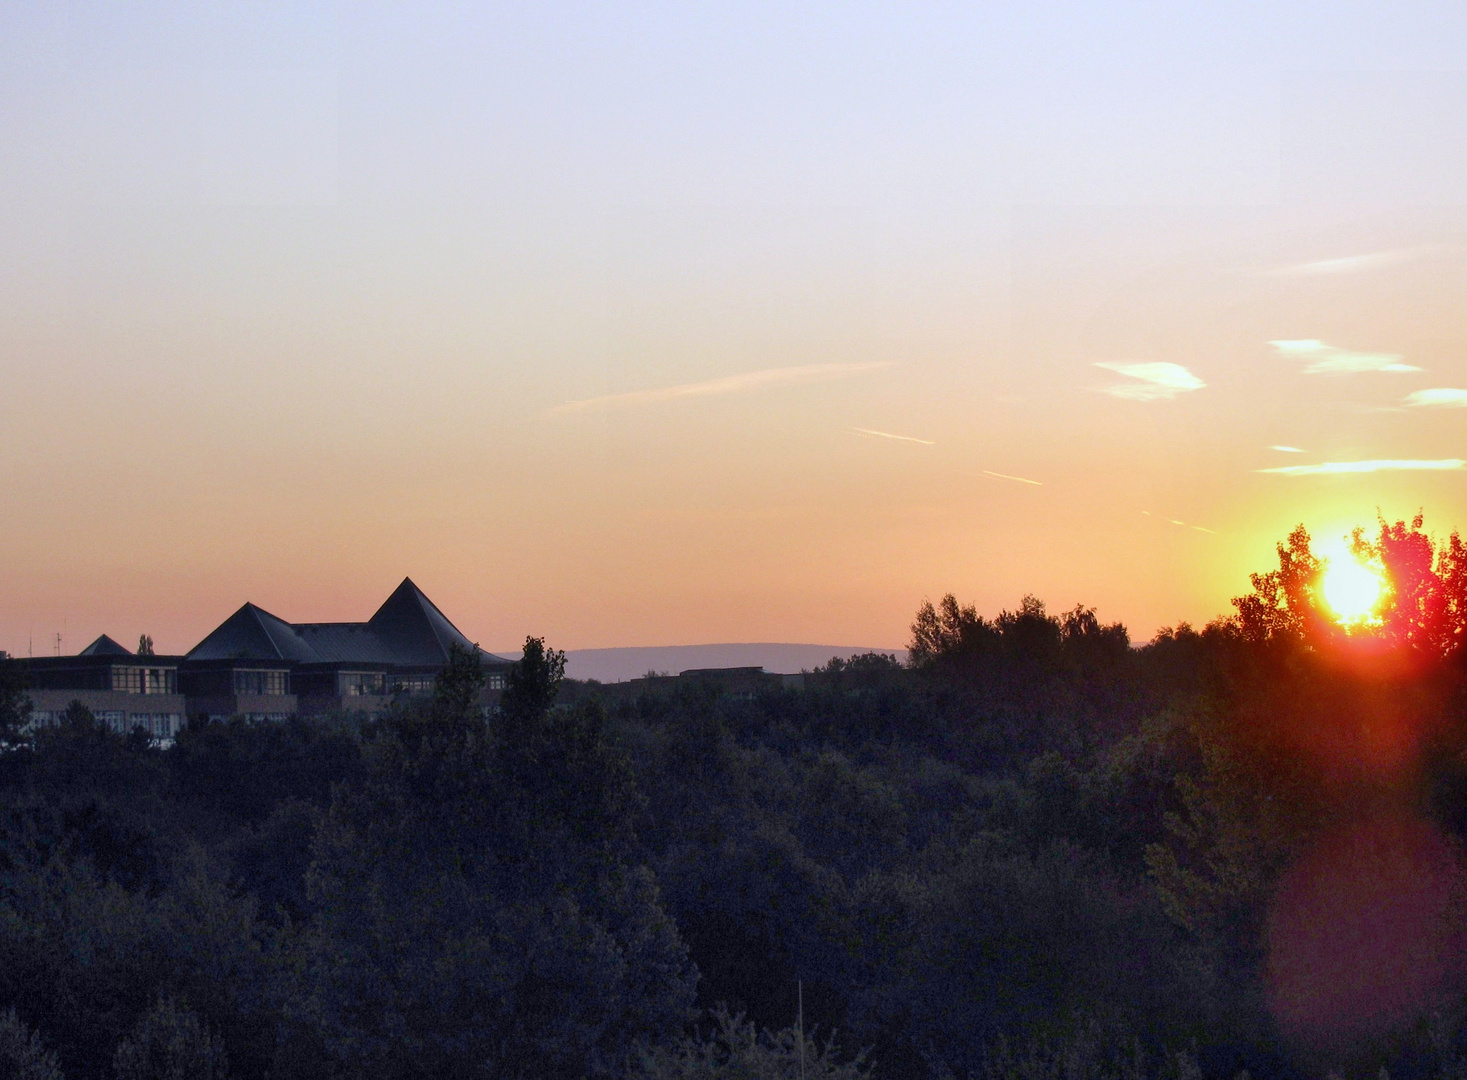 Sonnenaufgang am Roten Hügel in Bayreuth